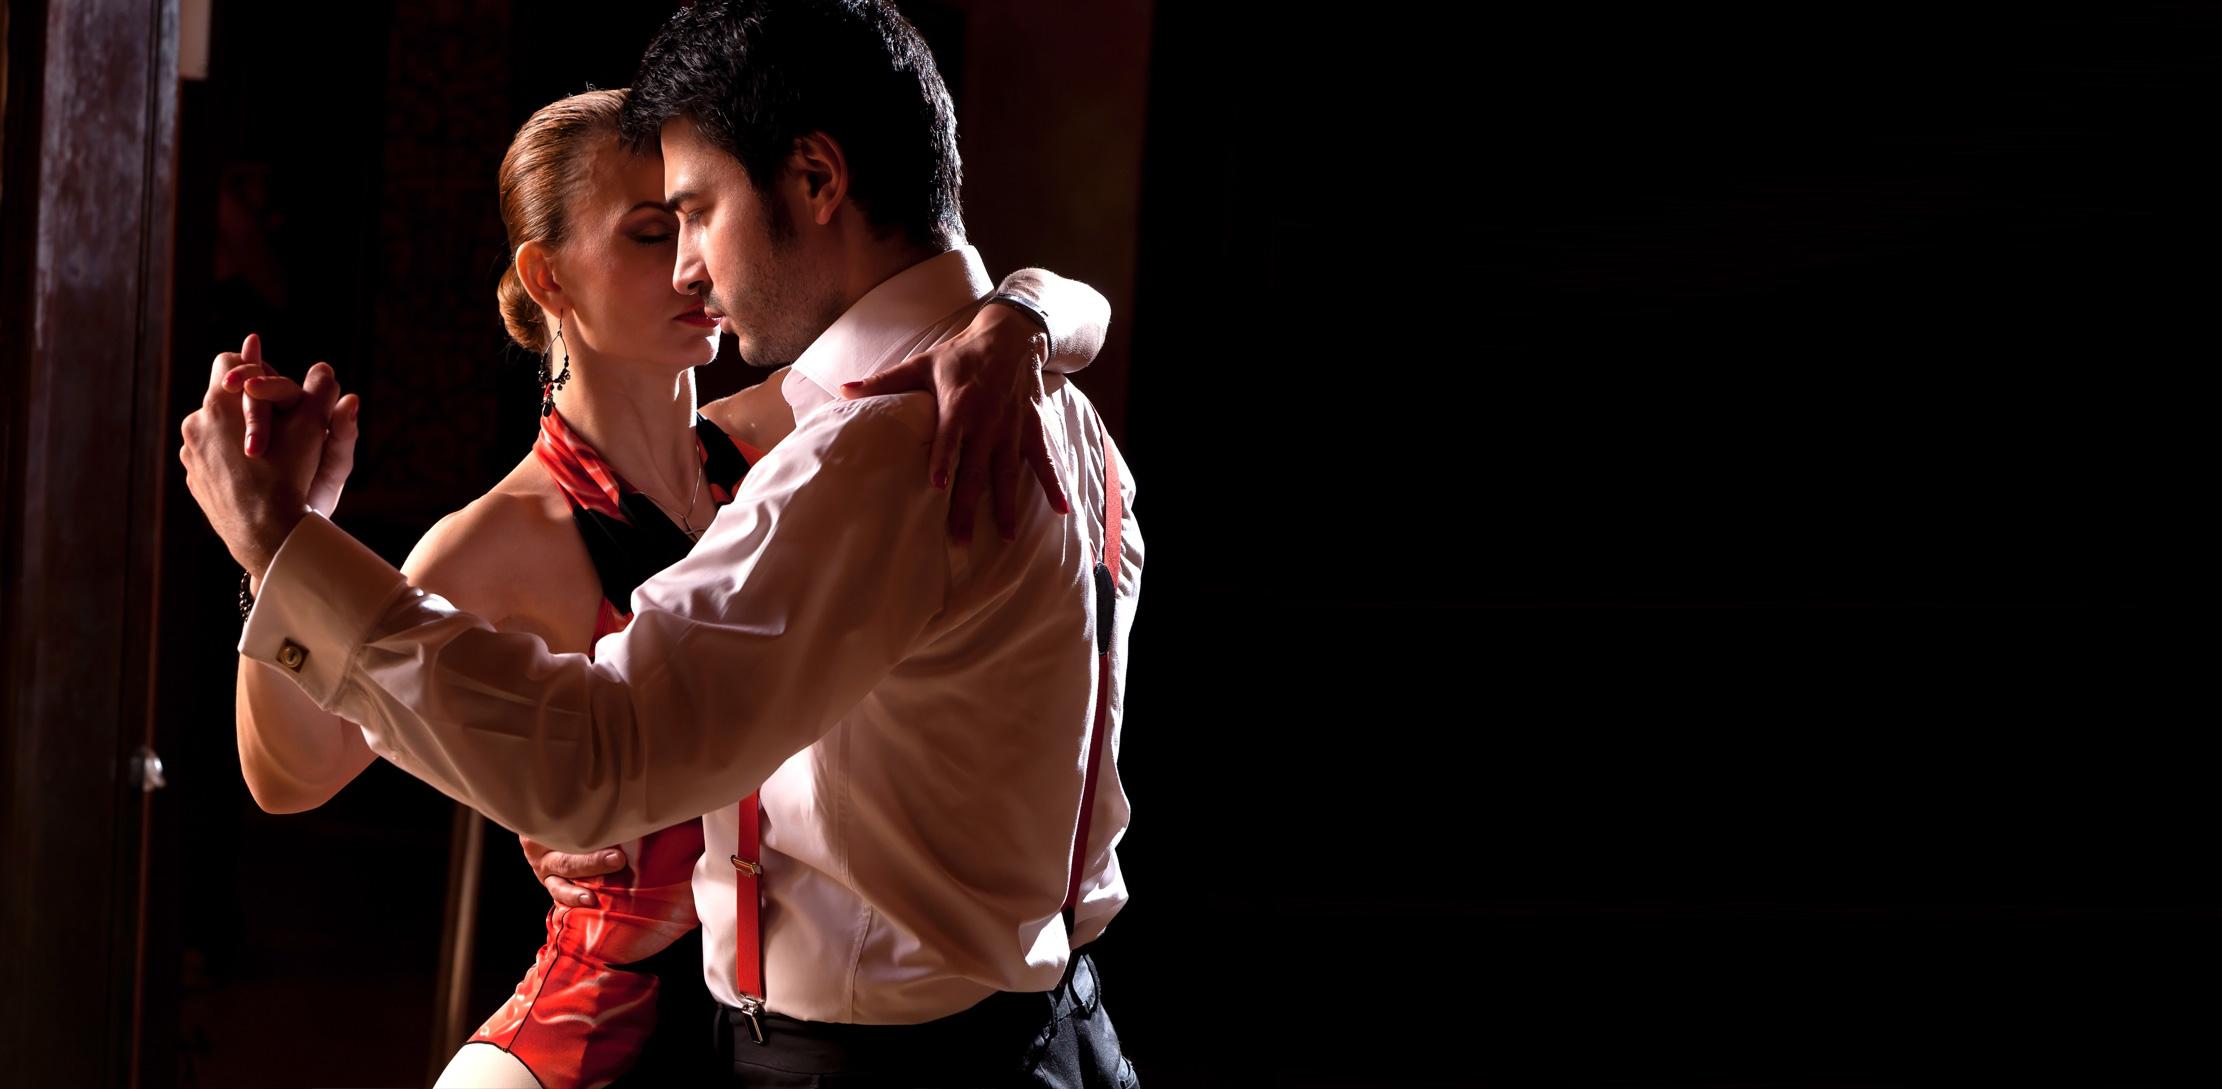 Rj Dance Studio Fun Affordable Dance Instruction That